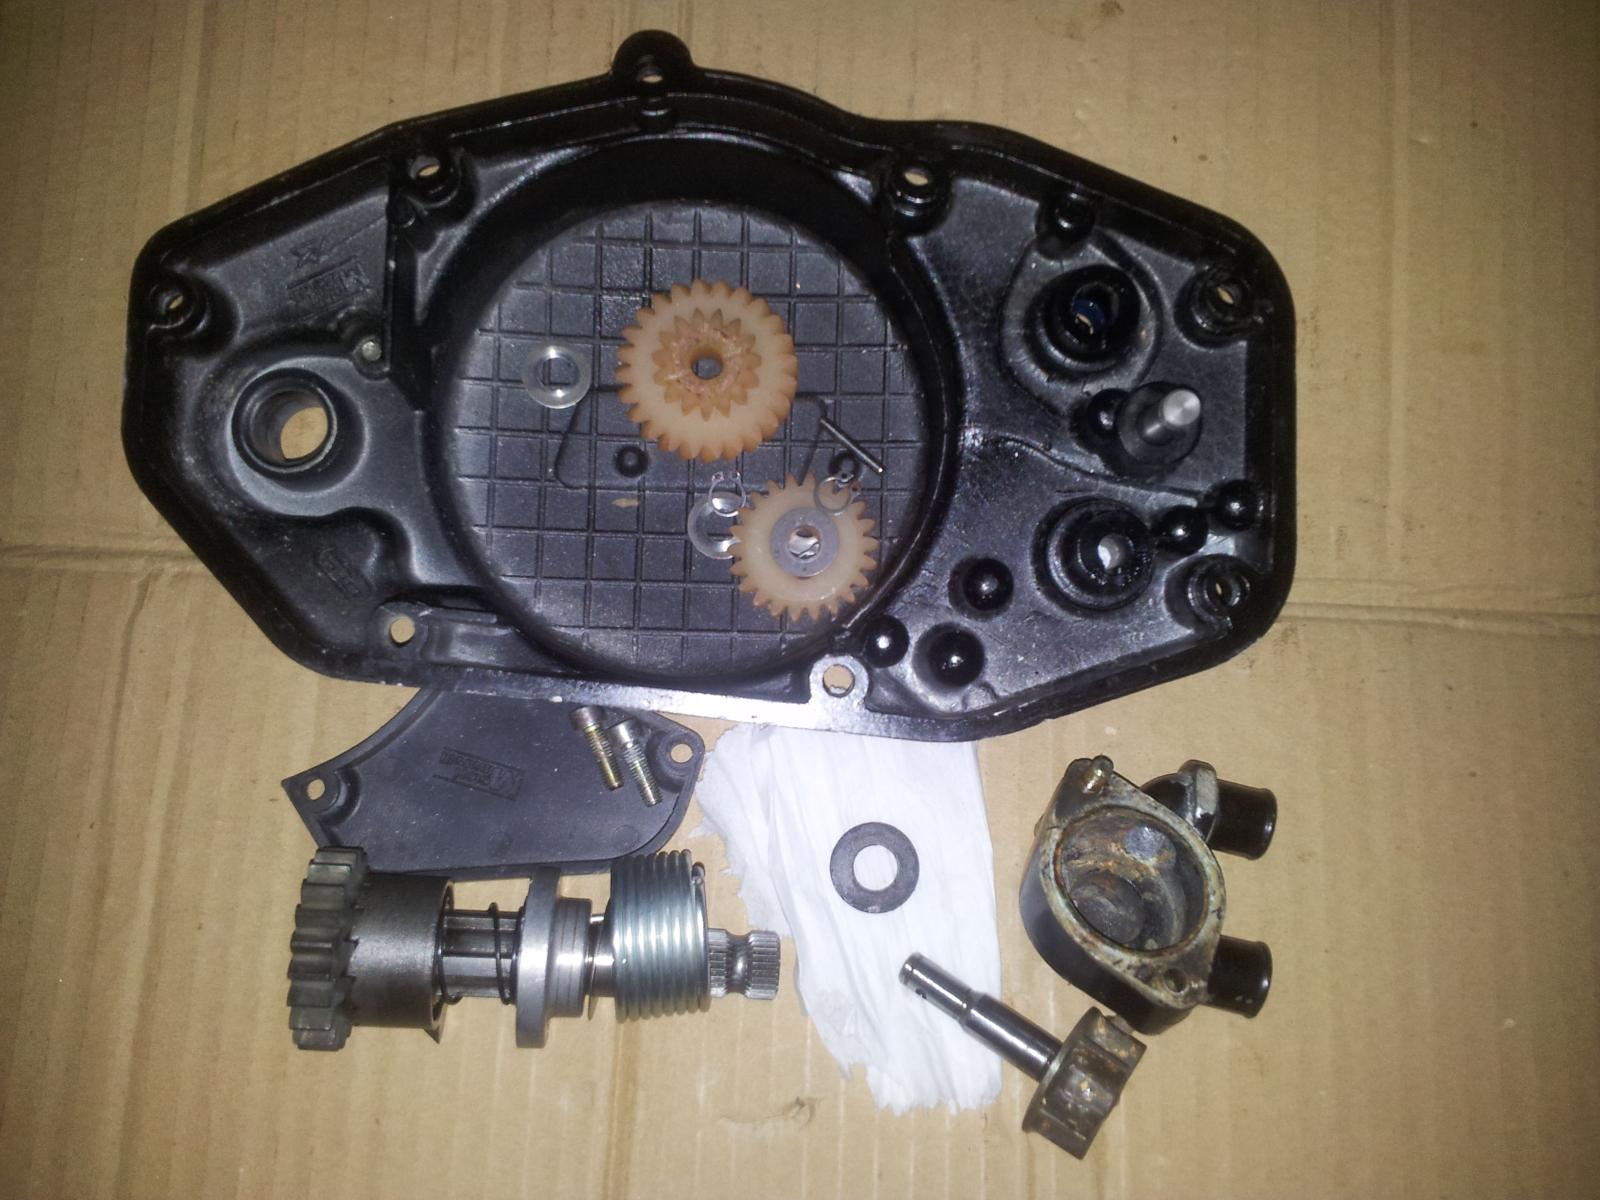 encendido - Mejoras en motores P3 P4 RV4 DL P6 K6... - Página 5 15znp06